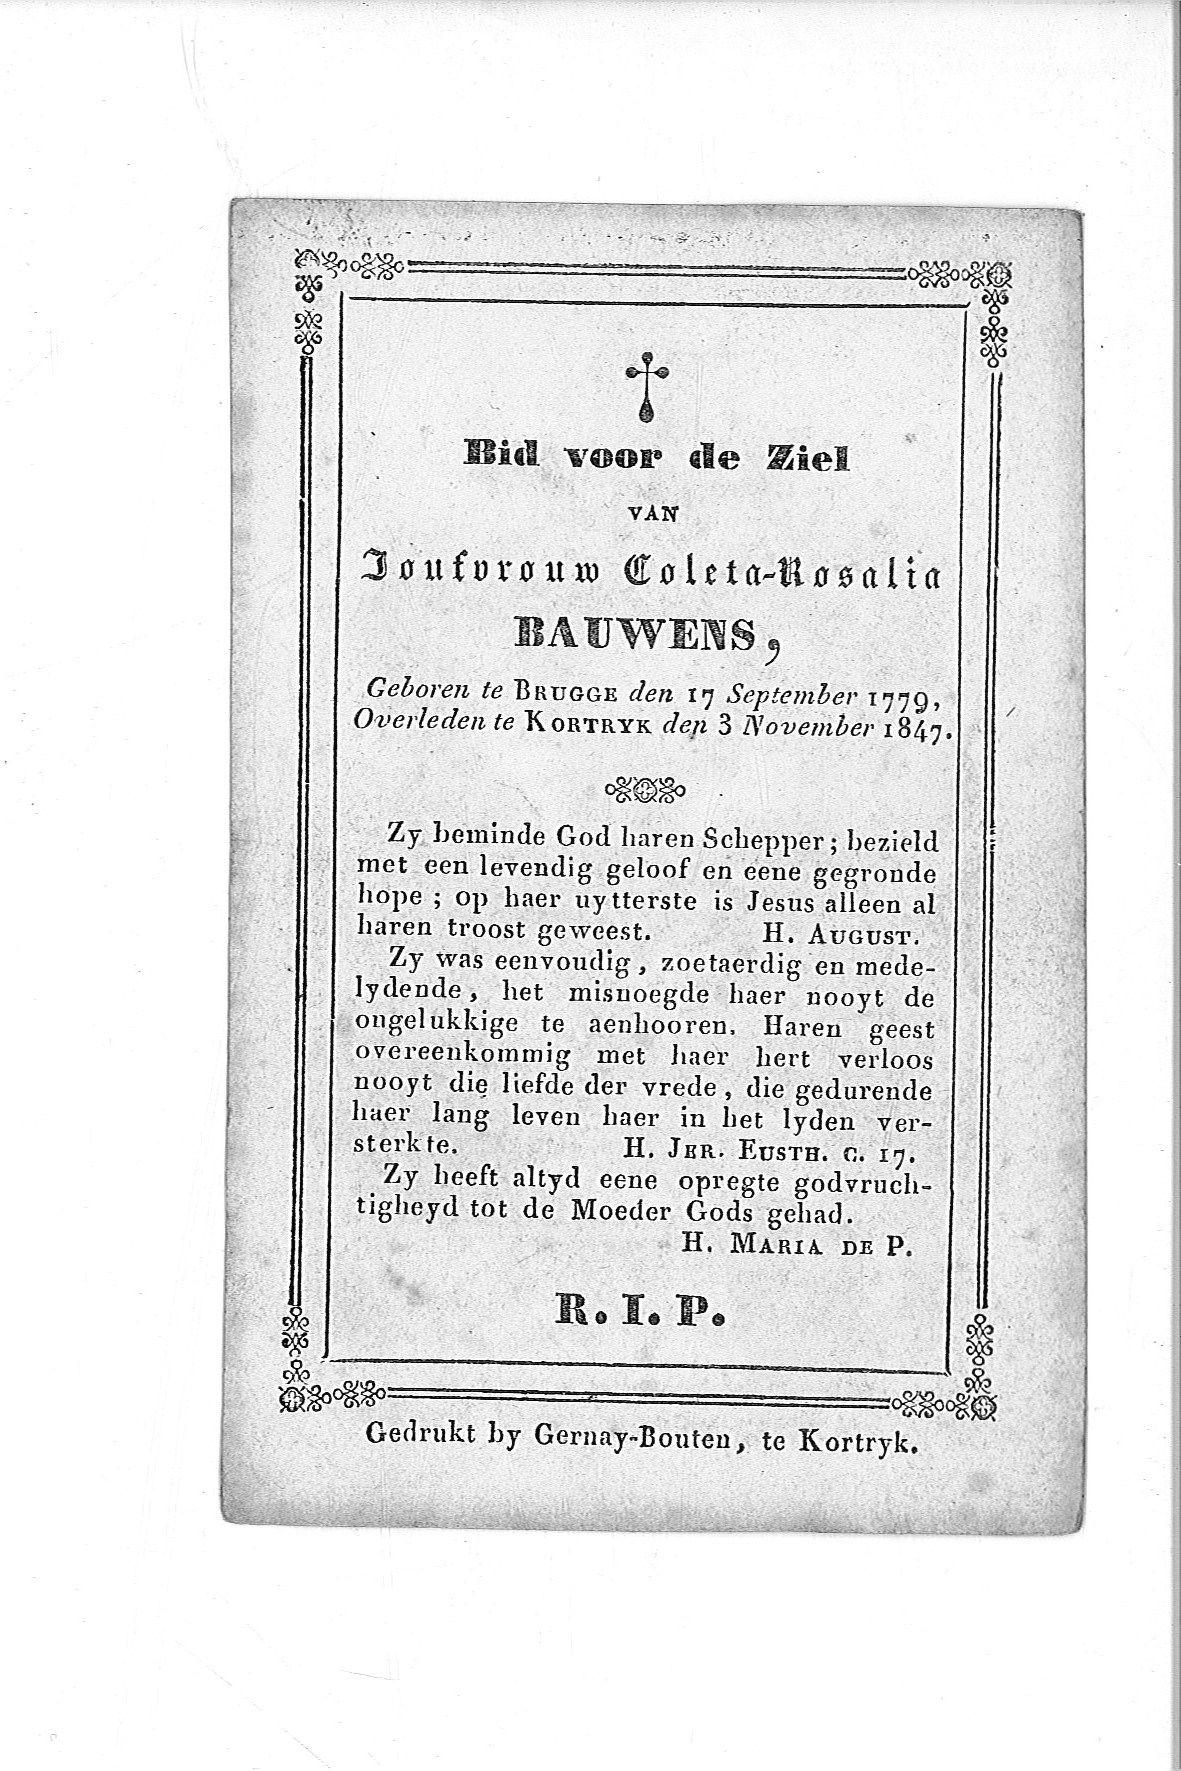 coleta-rosalia(1847)20090723104548_00017.jpg